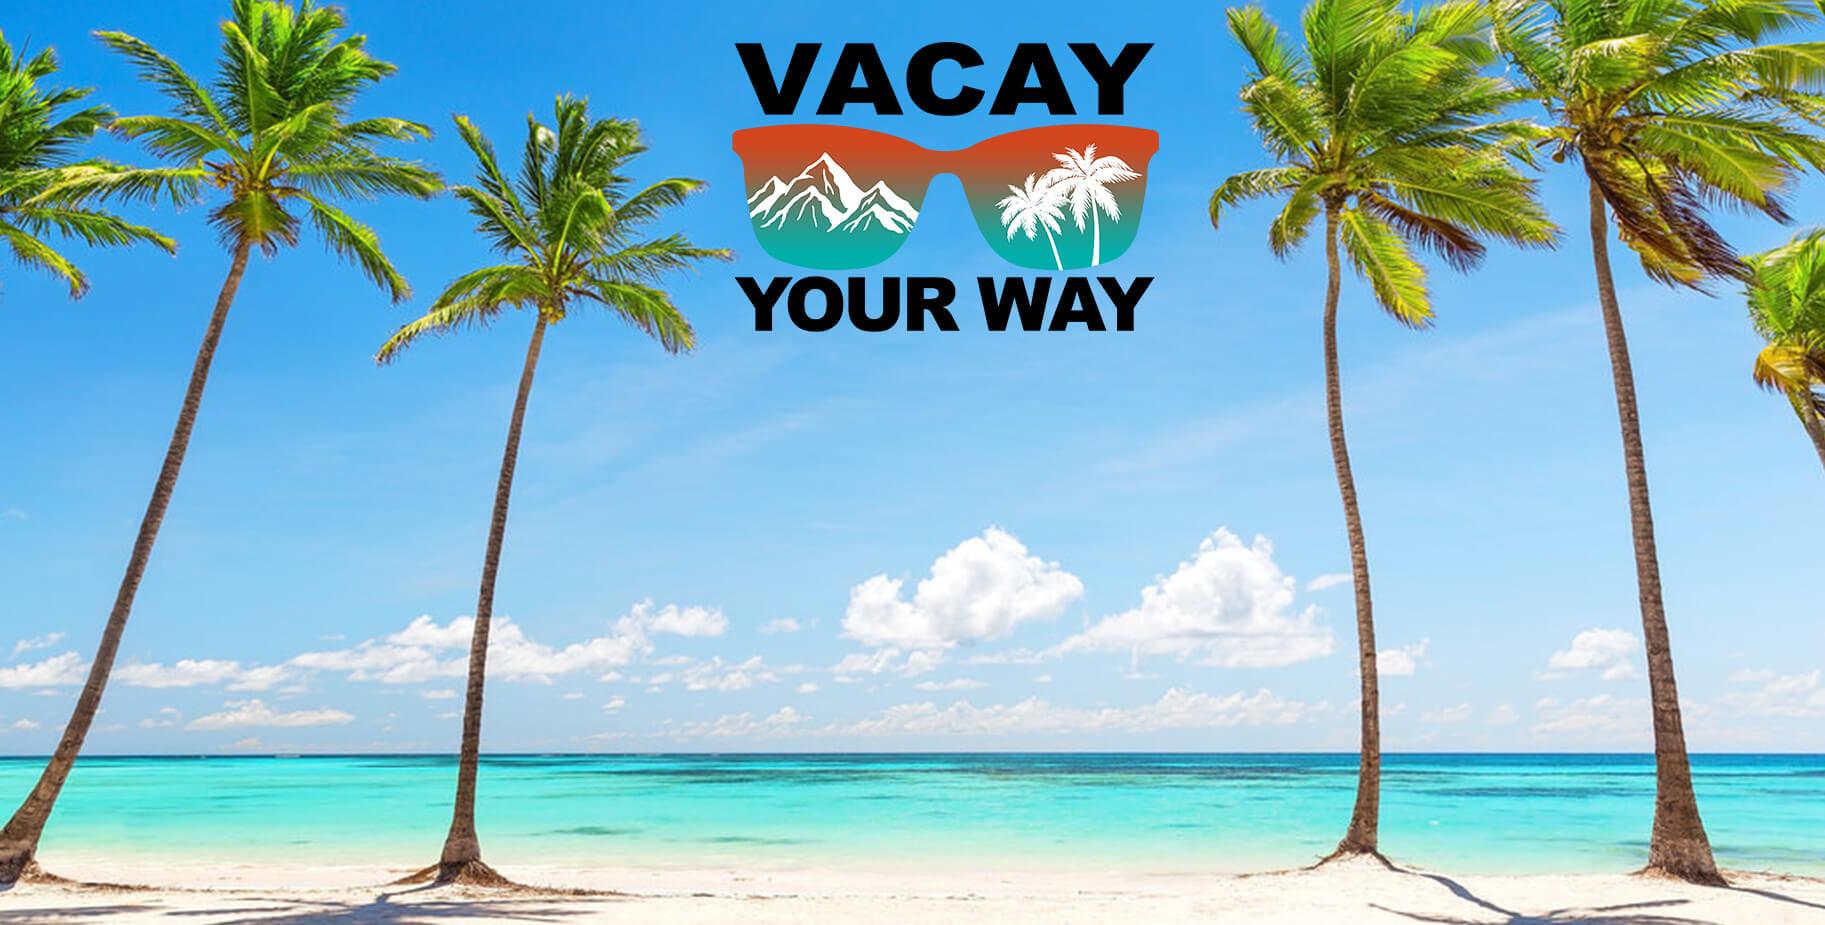 Vacay Your Way